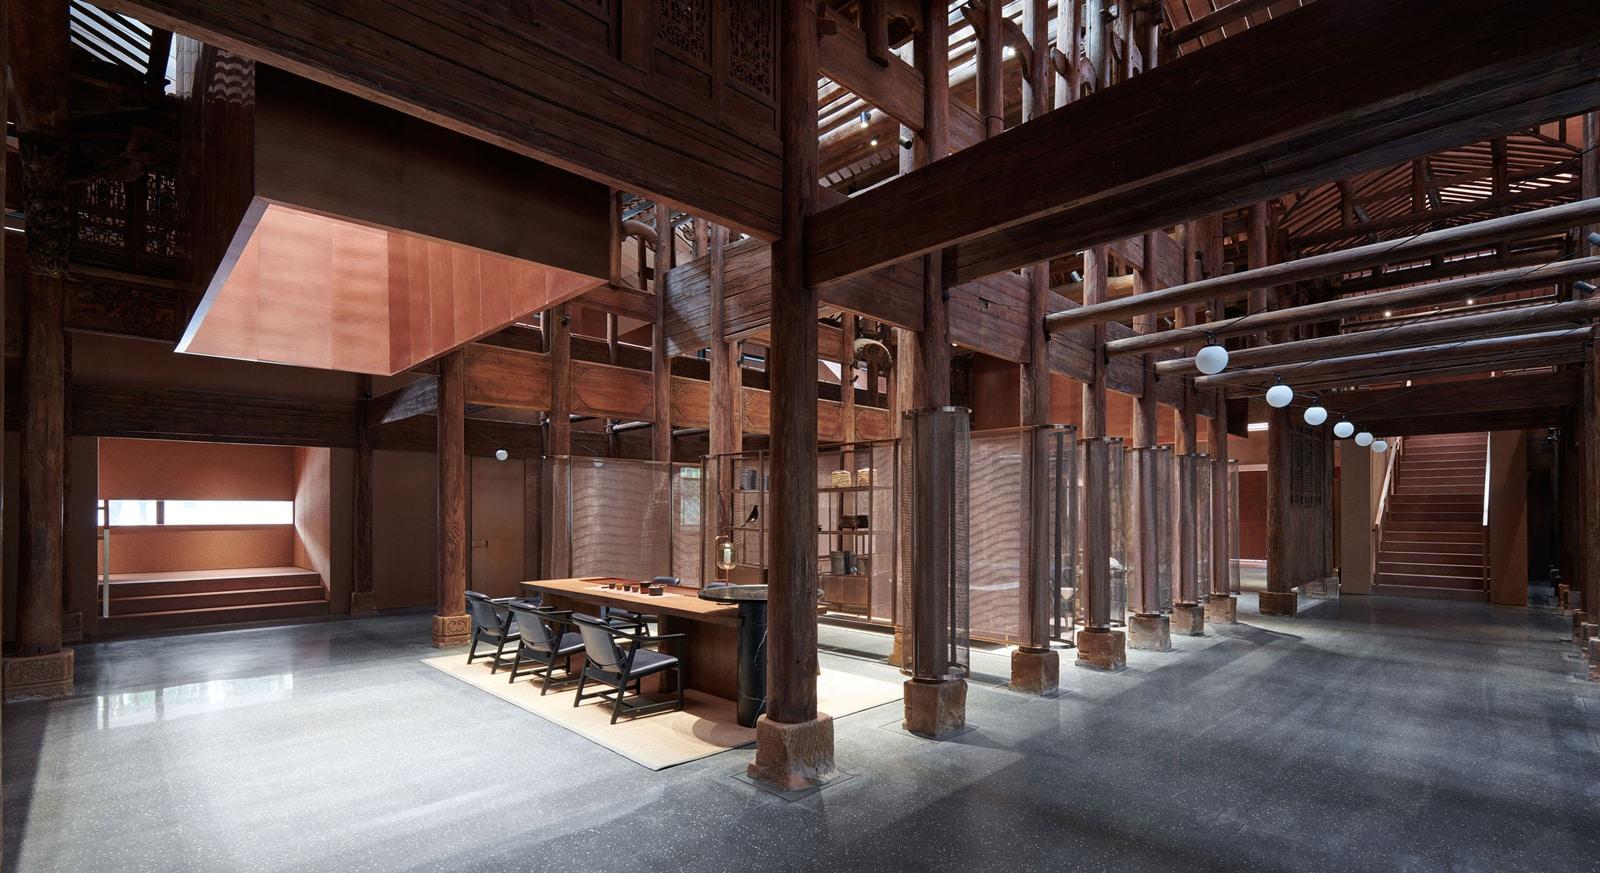 Fuzhou Teahouse  - 20210809 NeriHu FuzhouTeahouse 08 50